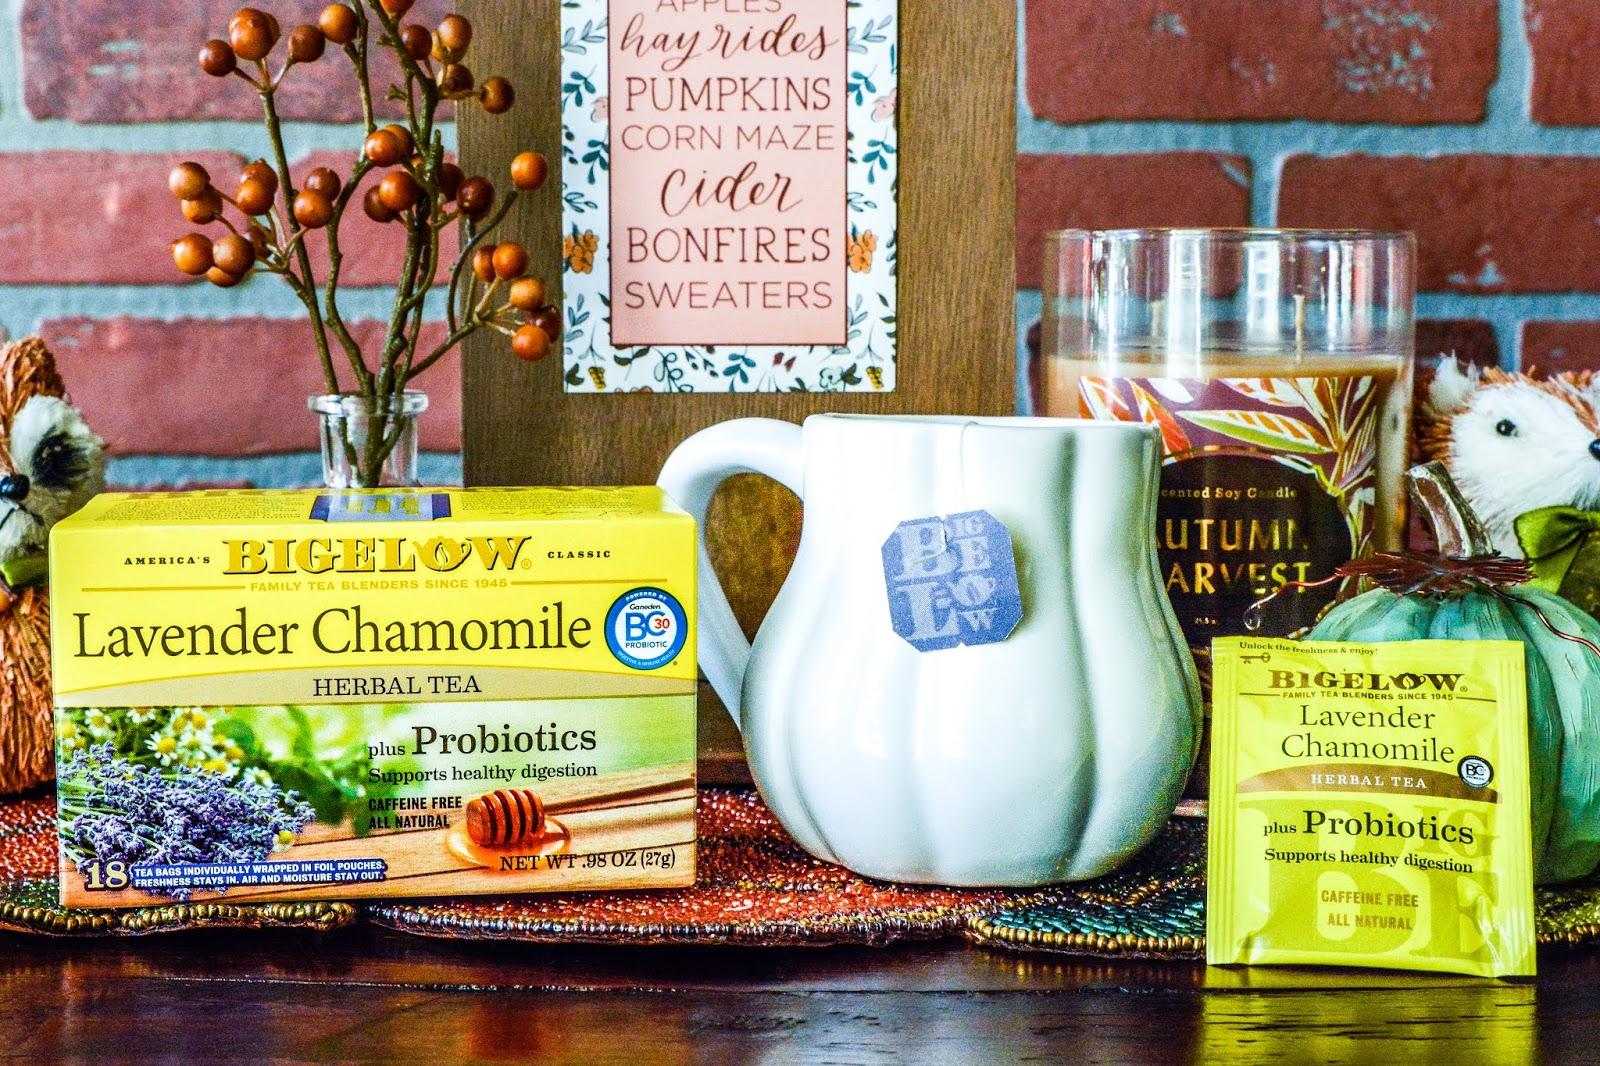 Bigelow Lavender Chamomile Tea